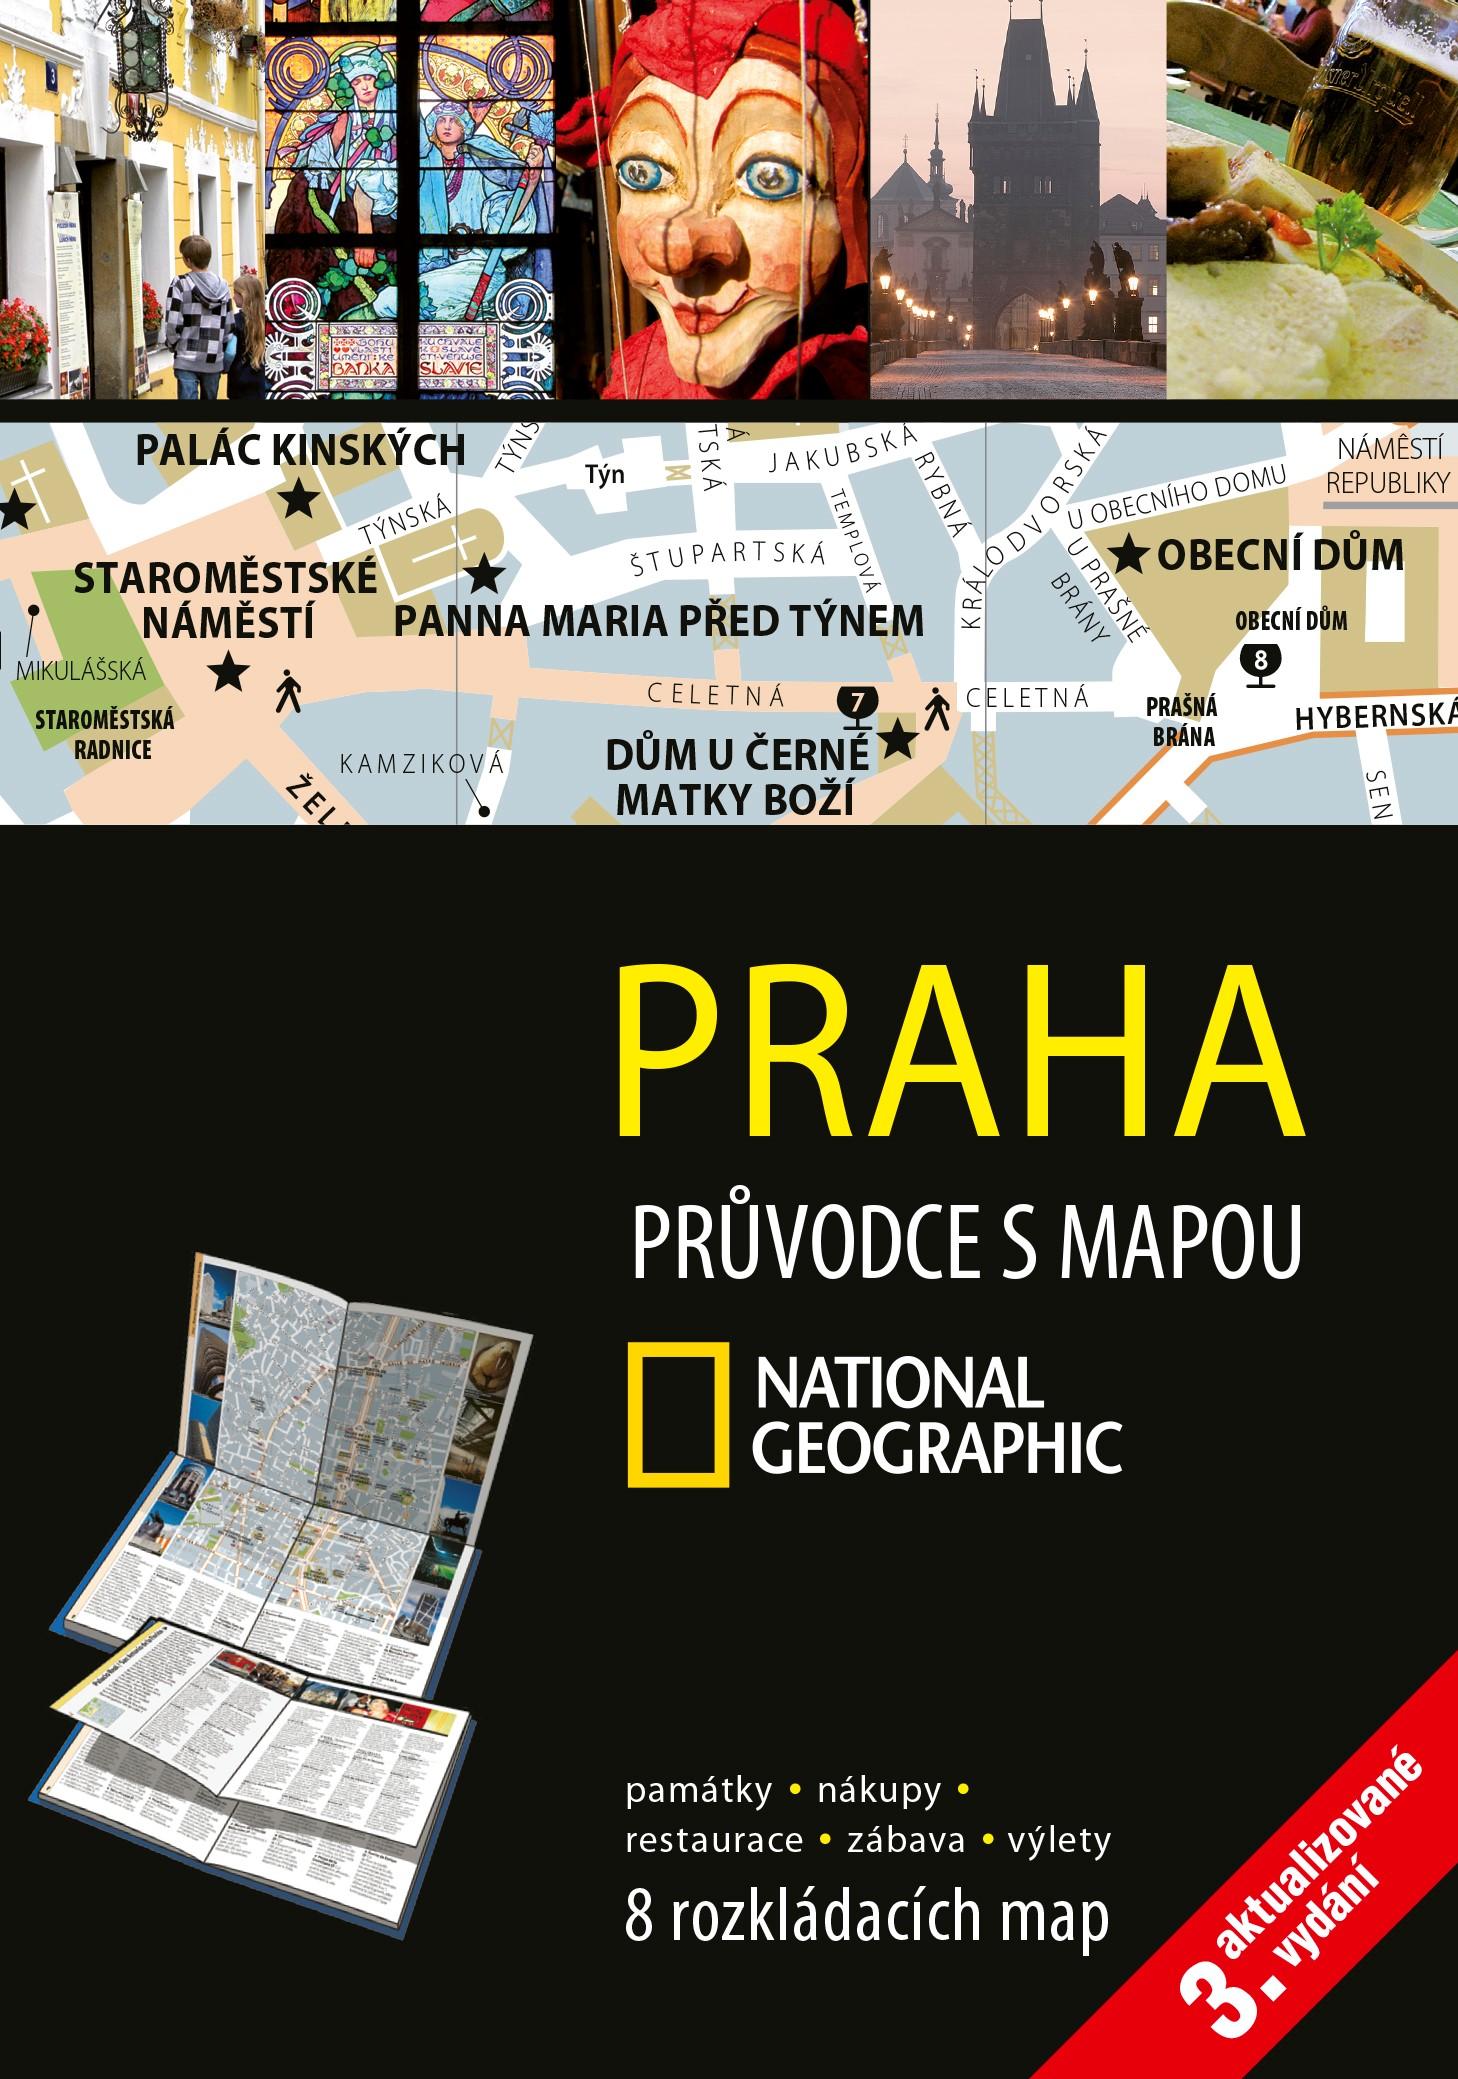 National Geographic průvodce s mapou Praha 3